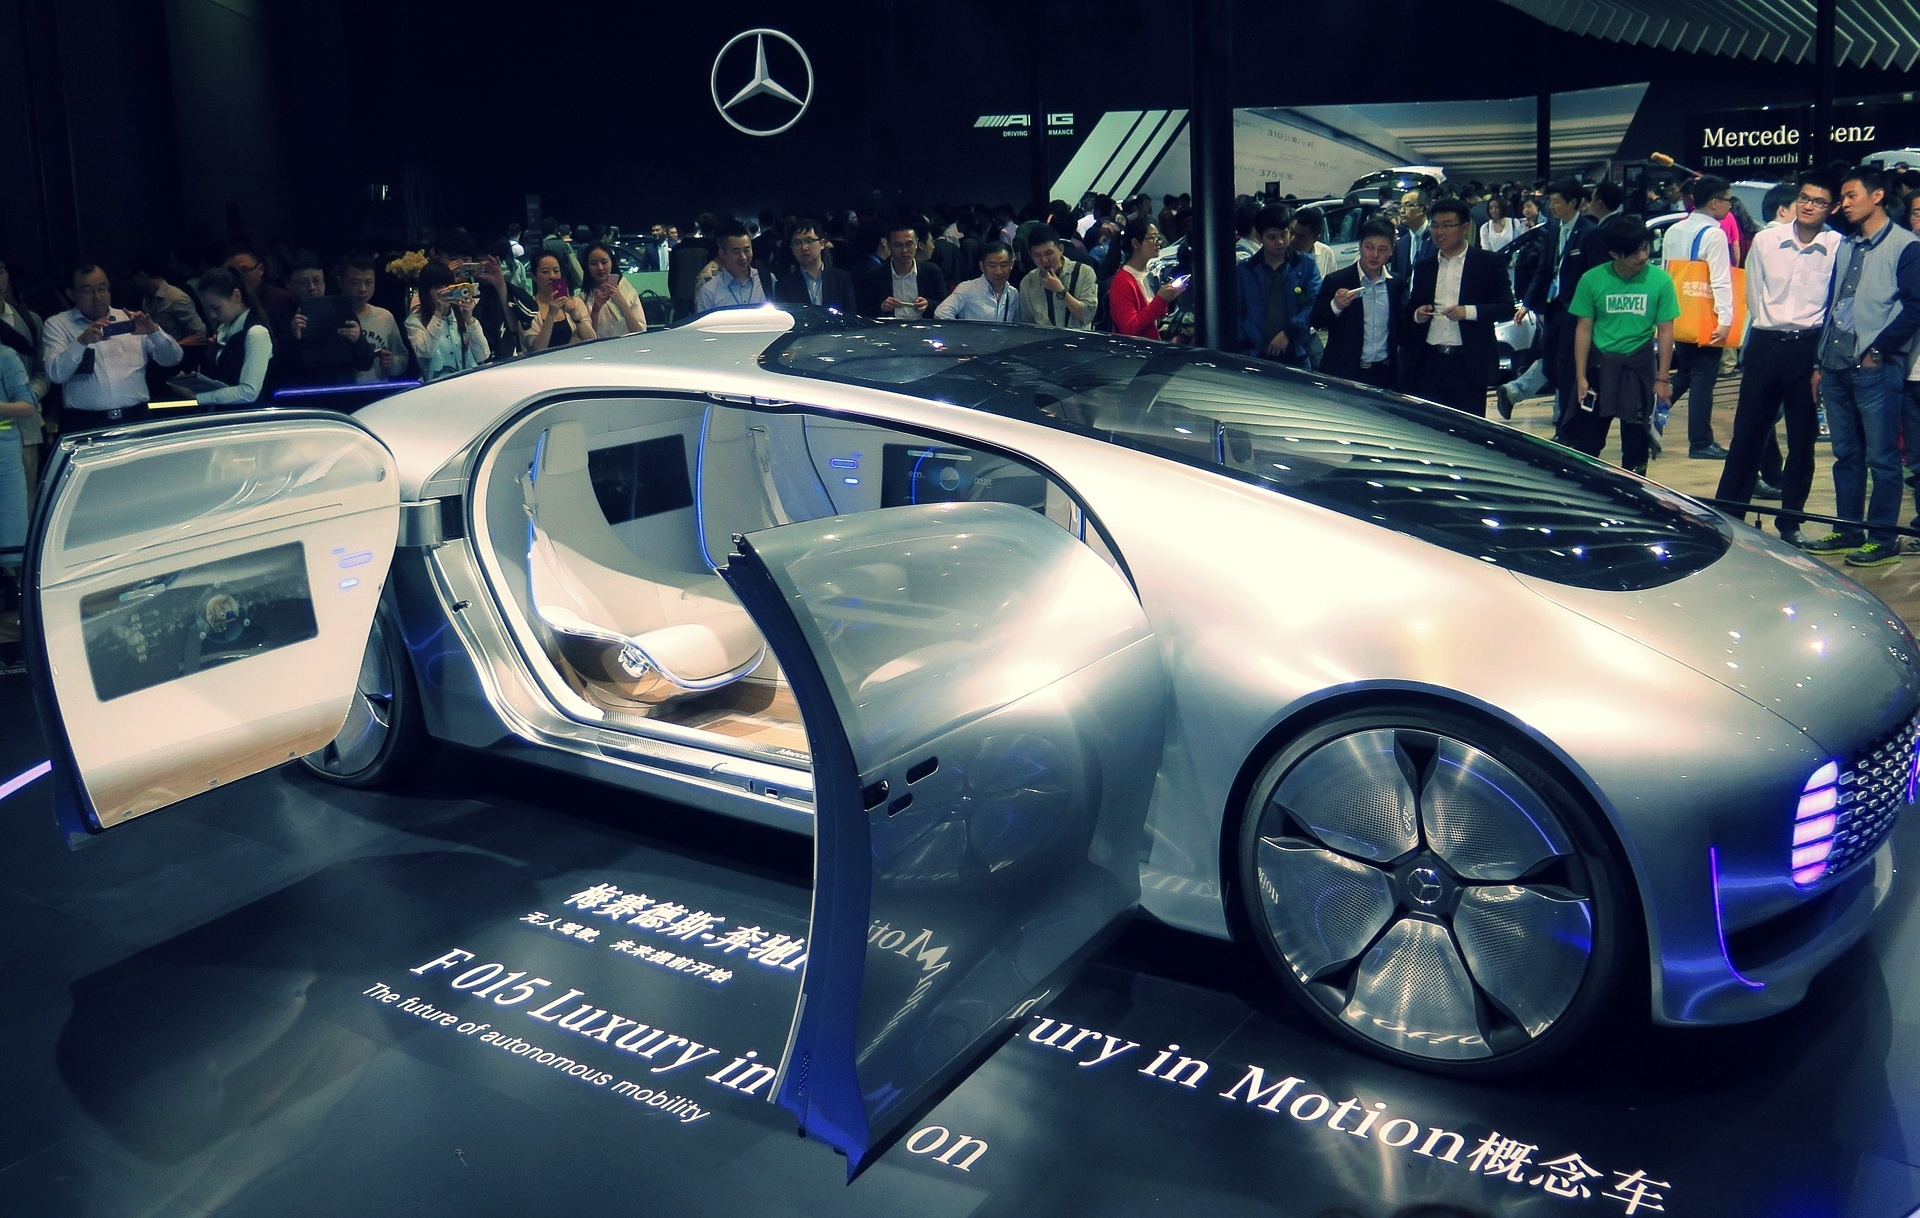 Mercedes Benz F015 concept car (Pixabay)-703506-edited.jpg